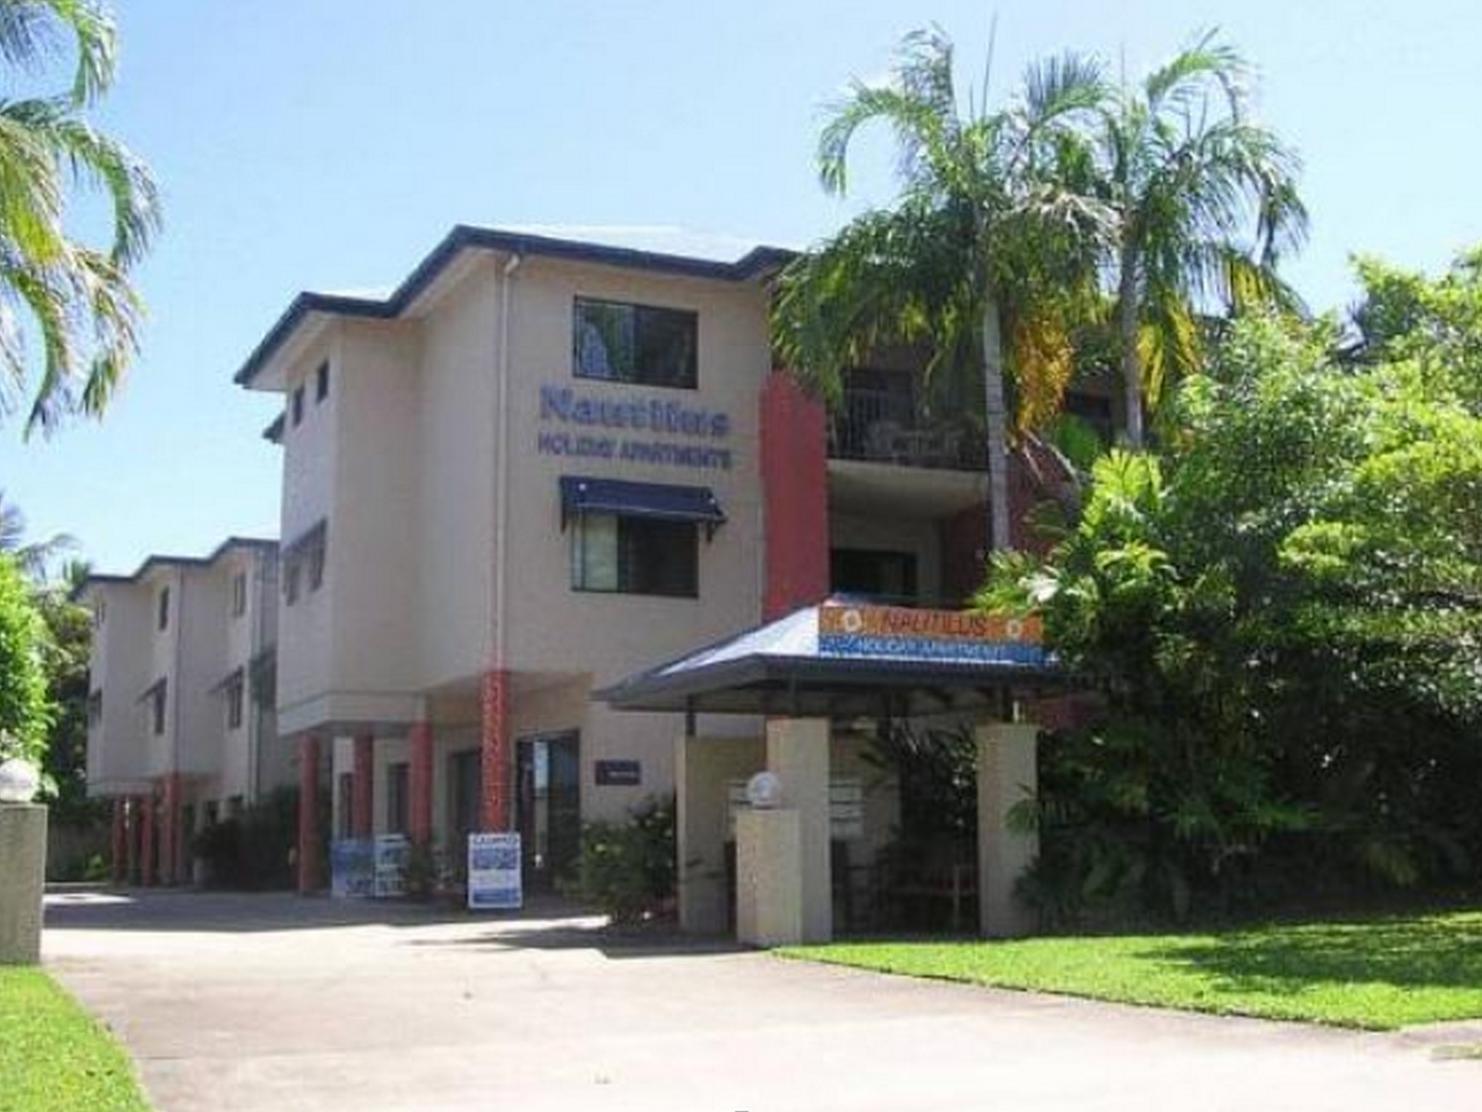 Nautilus Holiday Apartments - Hotell och Boende i Australien , Port Douglas